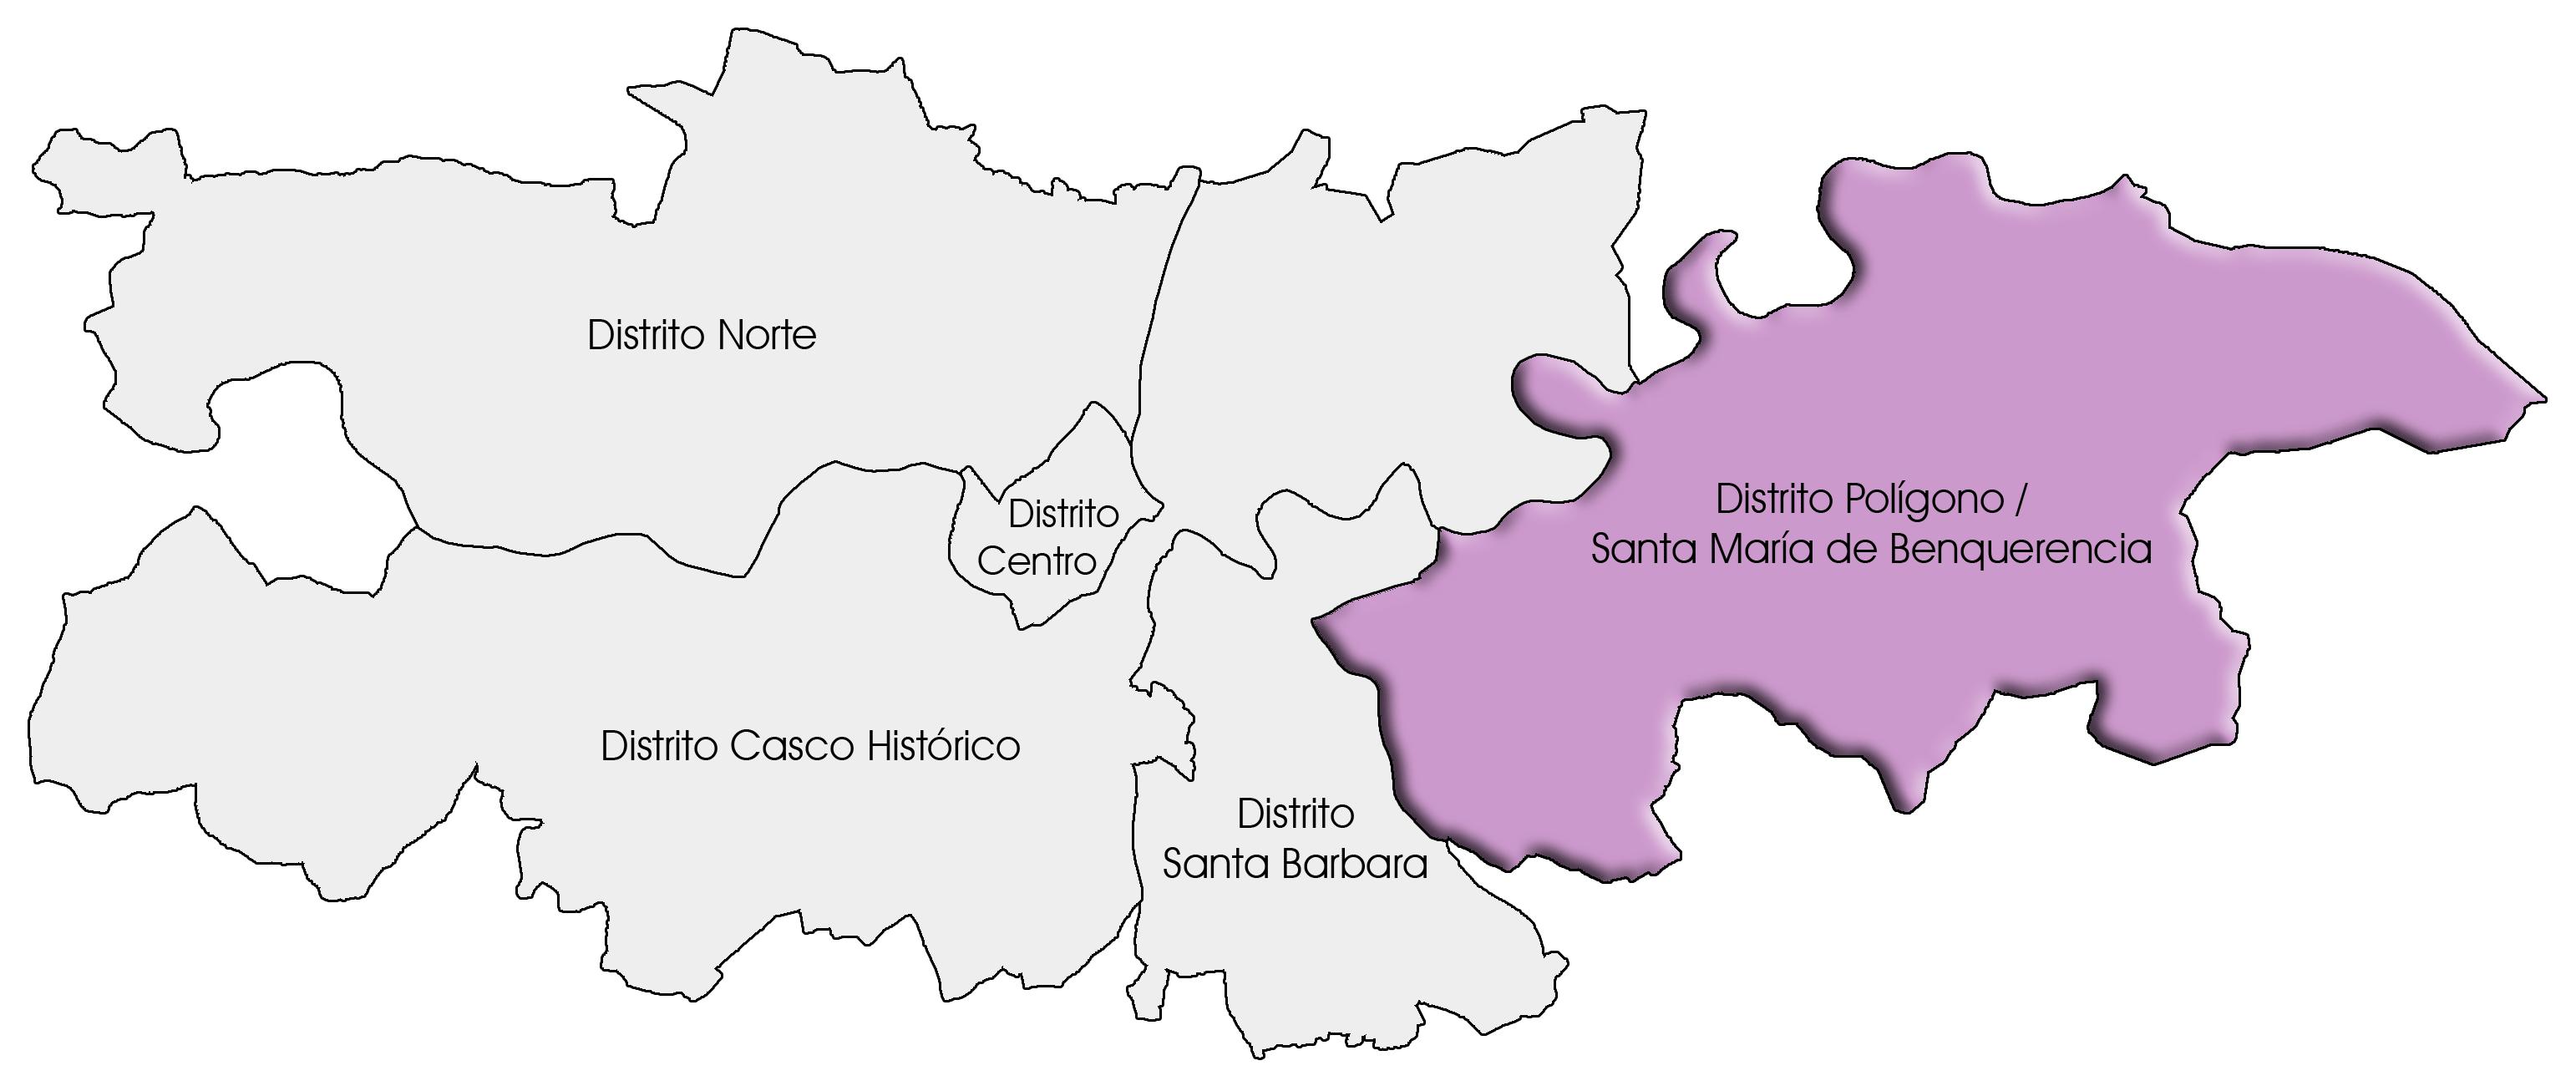 Distrito Polígono - Santa María de Benquerencia